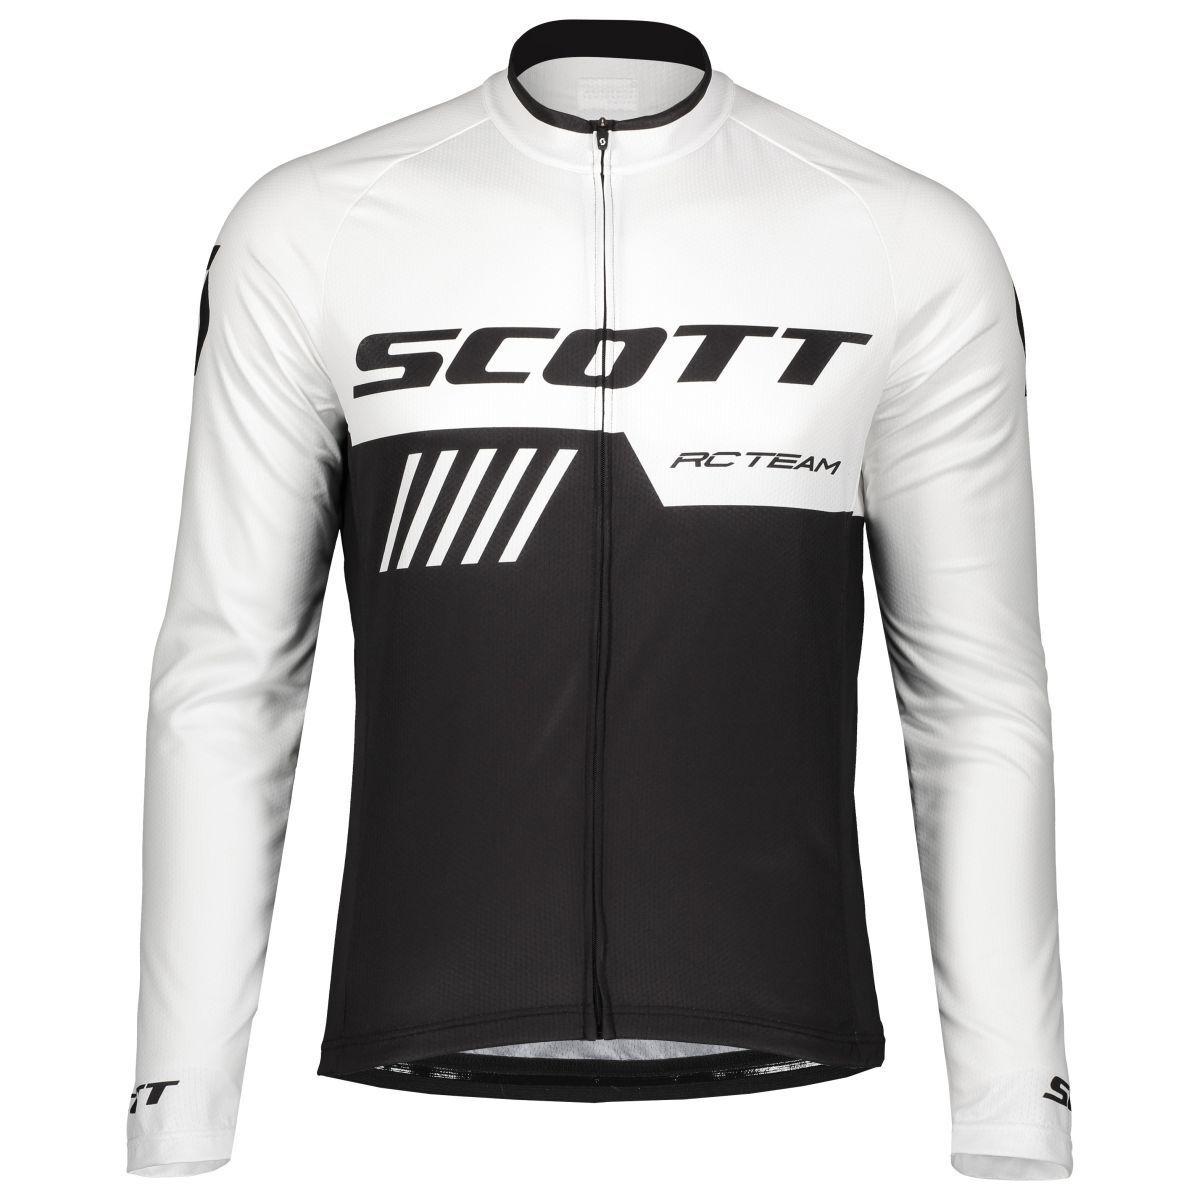 Scott RC Team 10 Bicicletta Maglia Lunga BiancoNero 2019